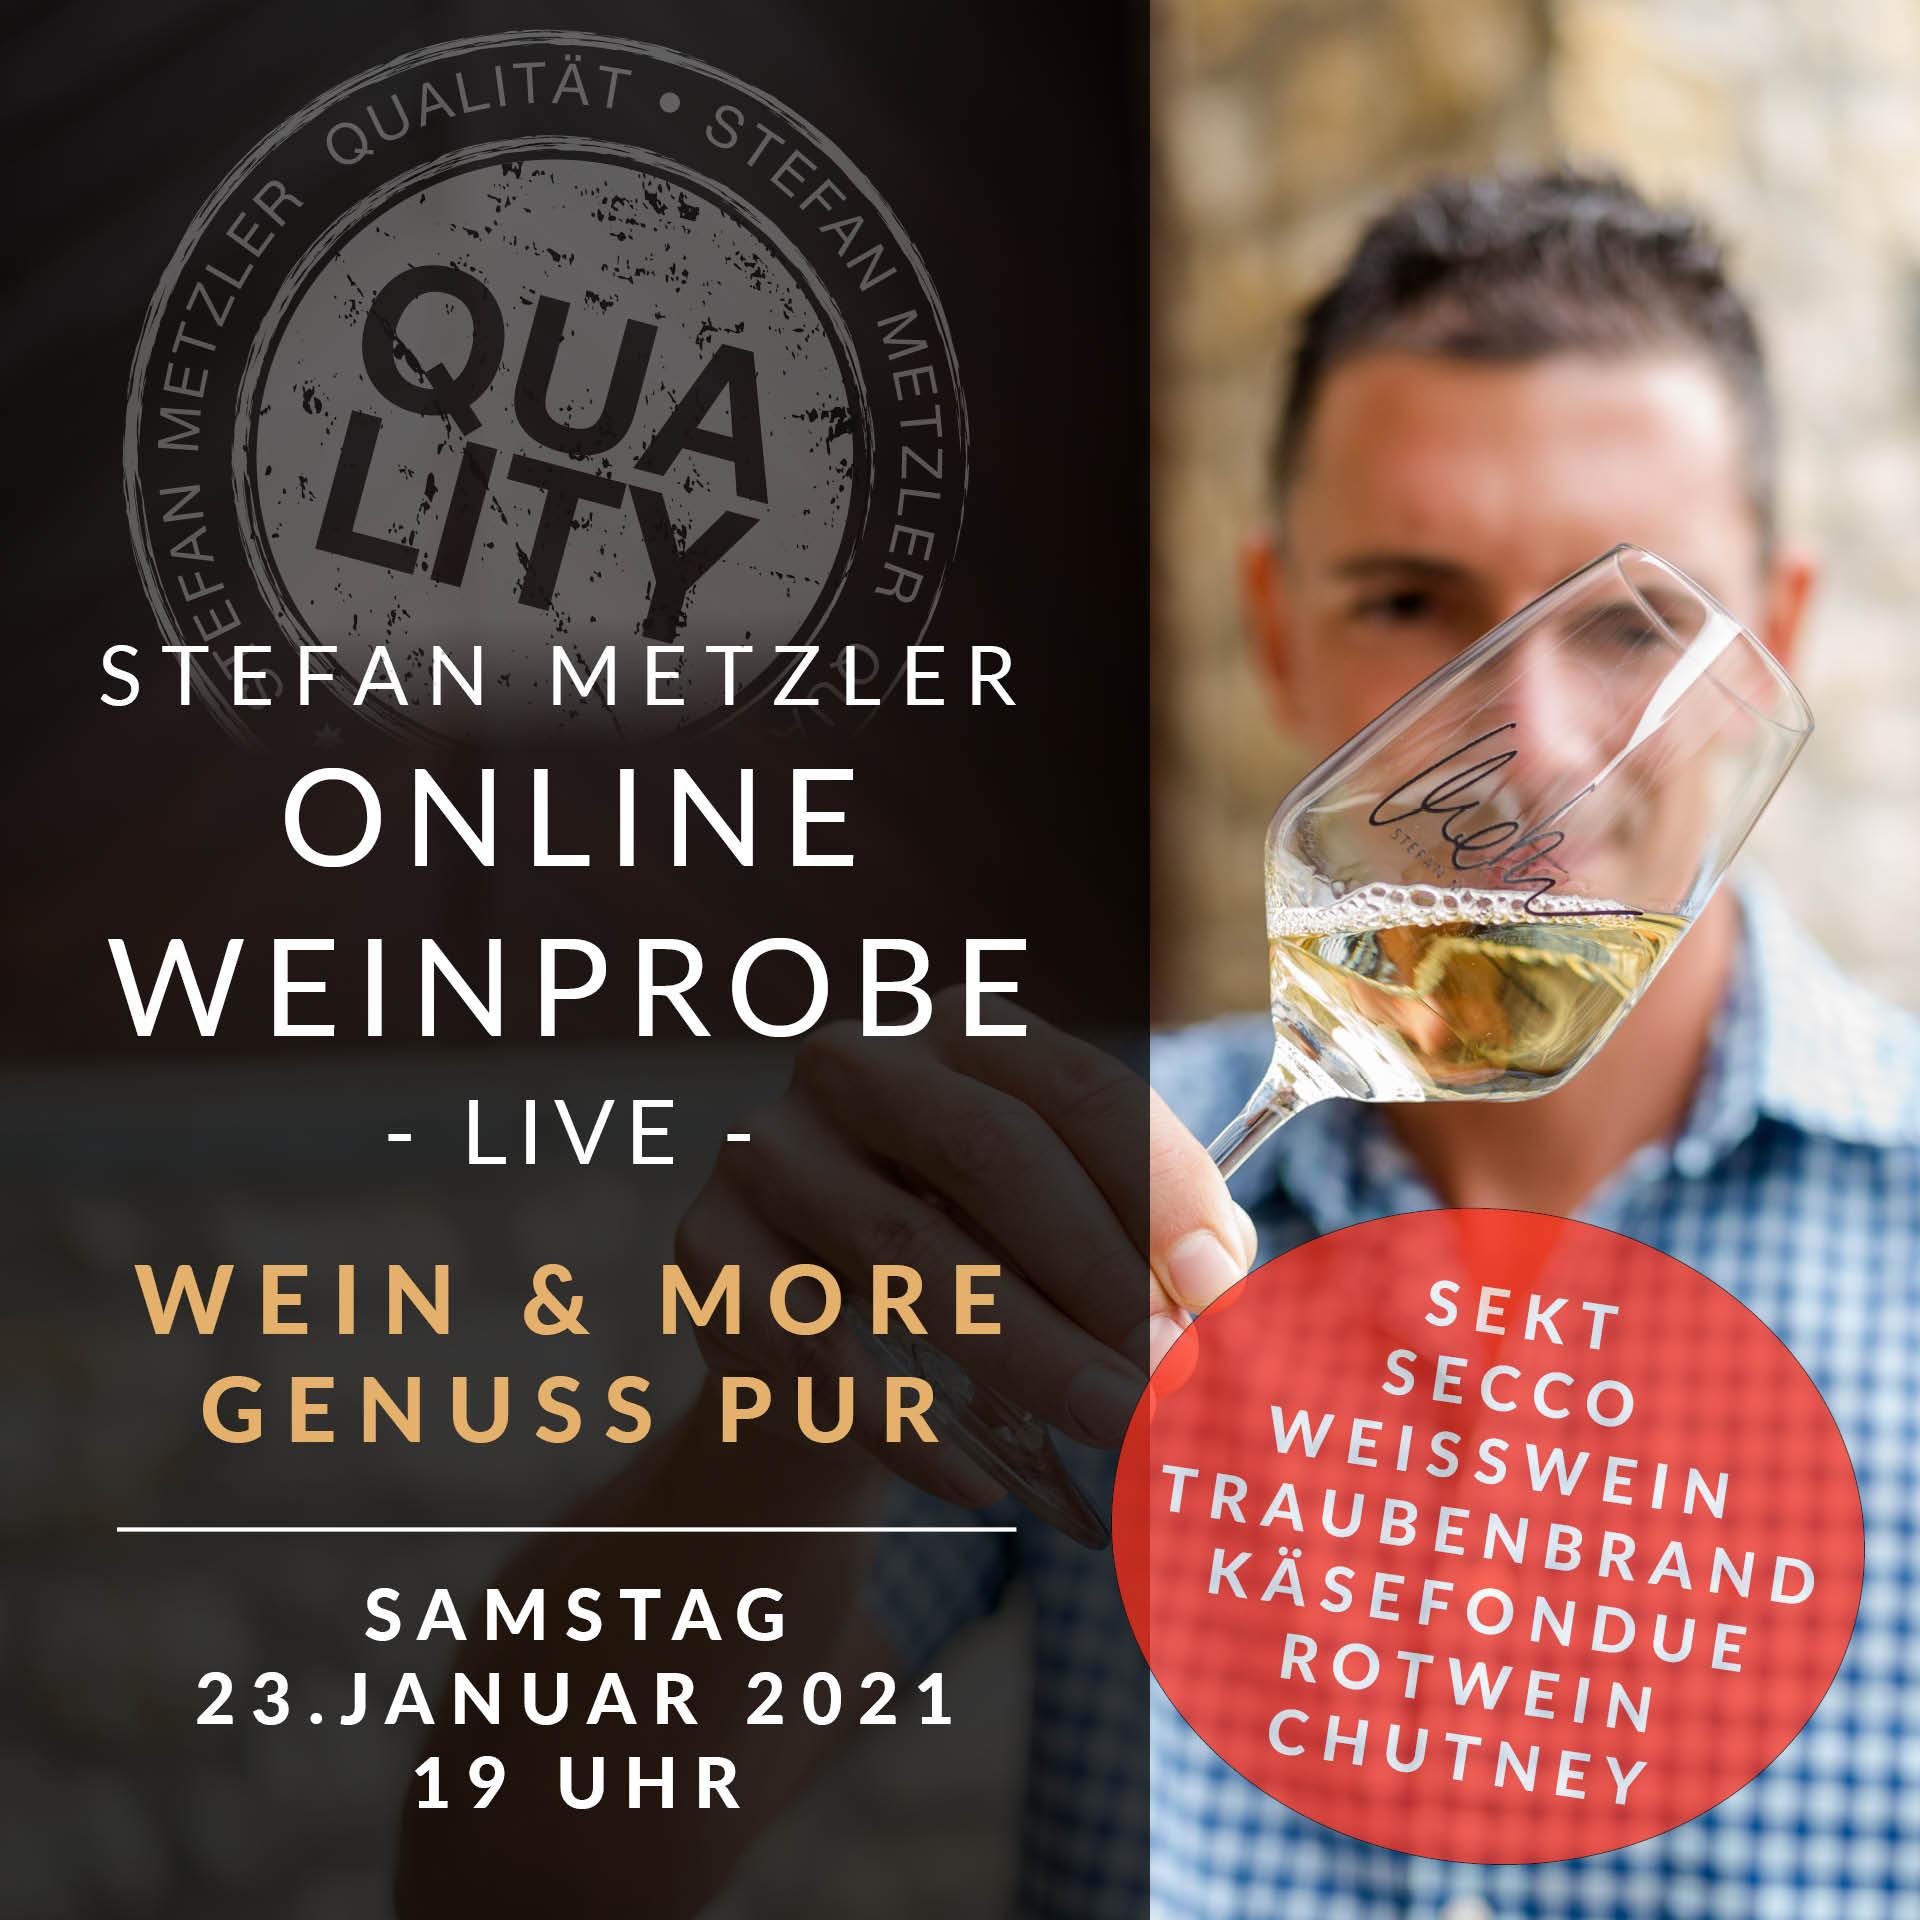 Onlineprobe 23.01.2021: Genuss pur - Wein, Sekt, Secco & Käsefondue